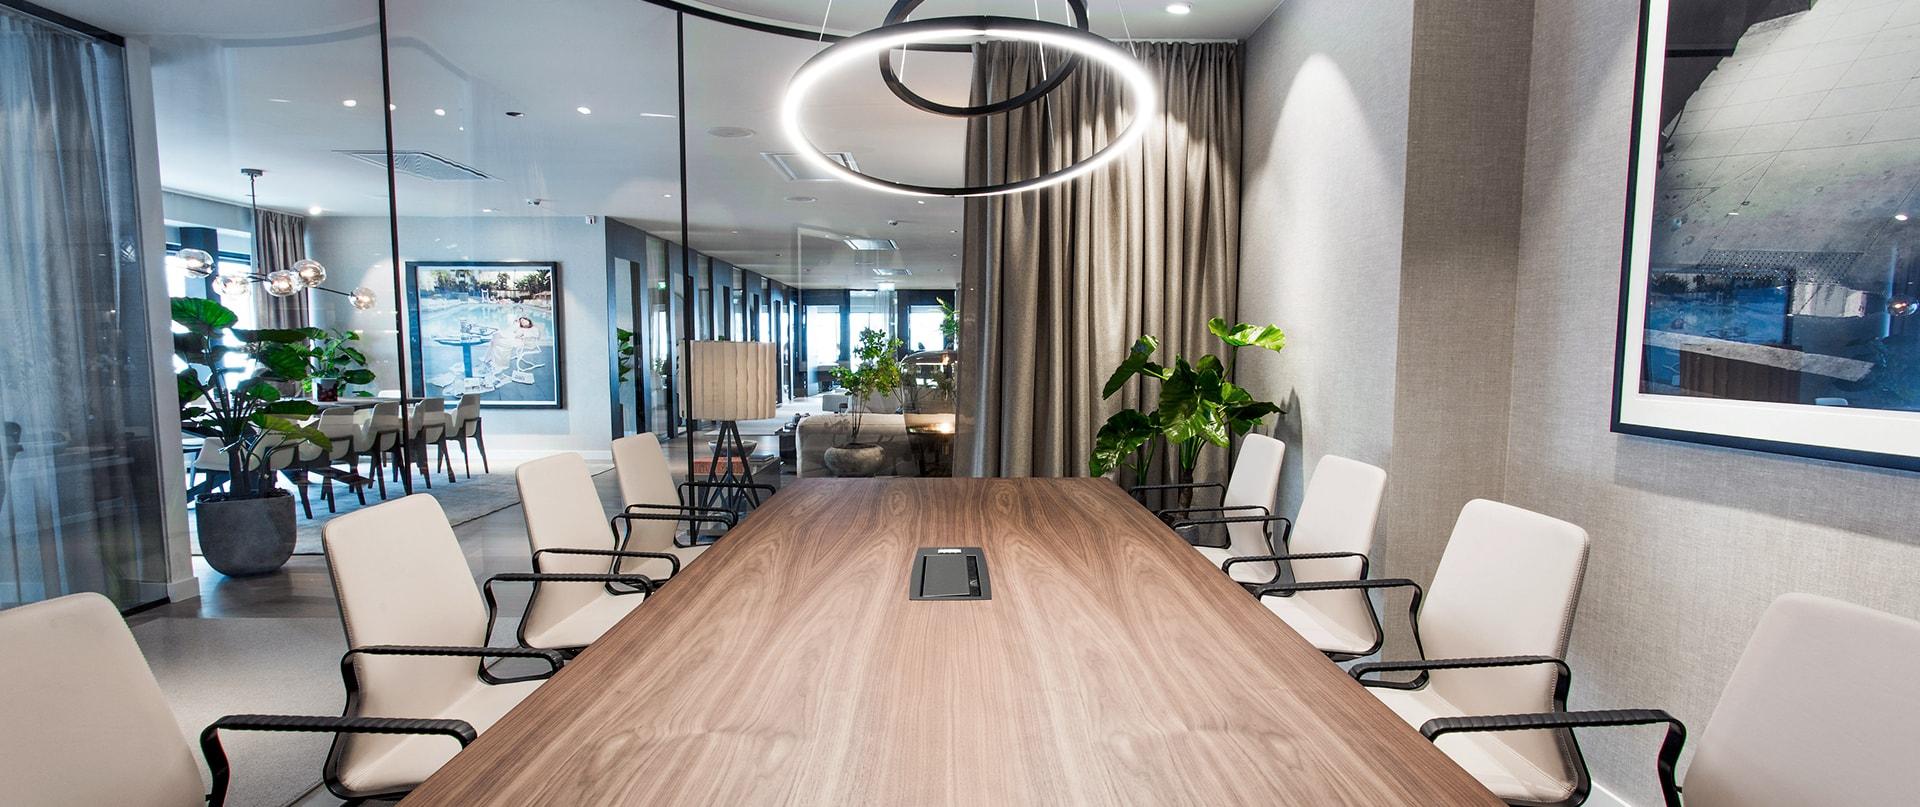 Modernt och stilrent konferensrum hos Järngrinden